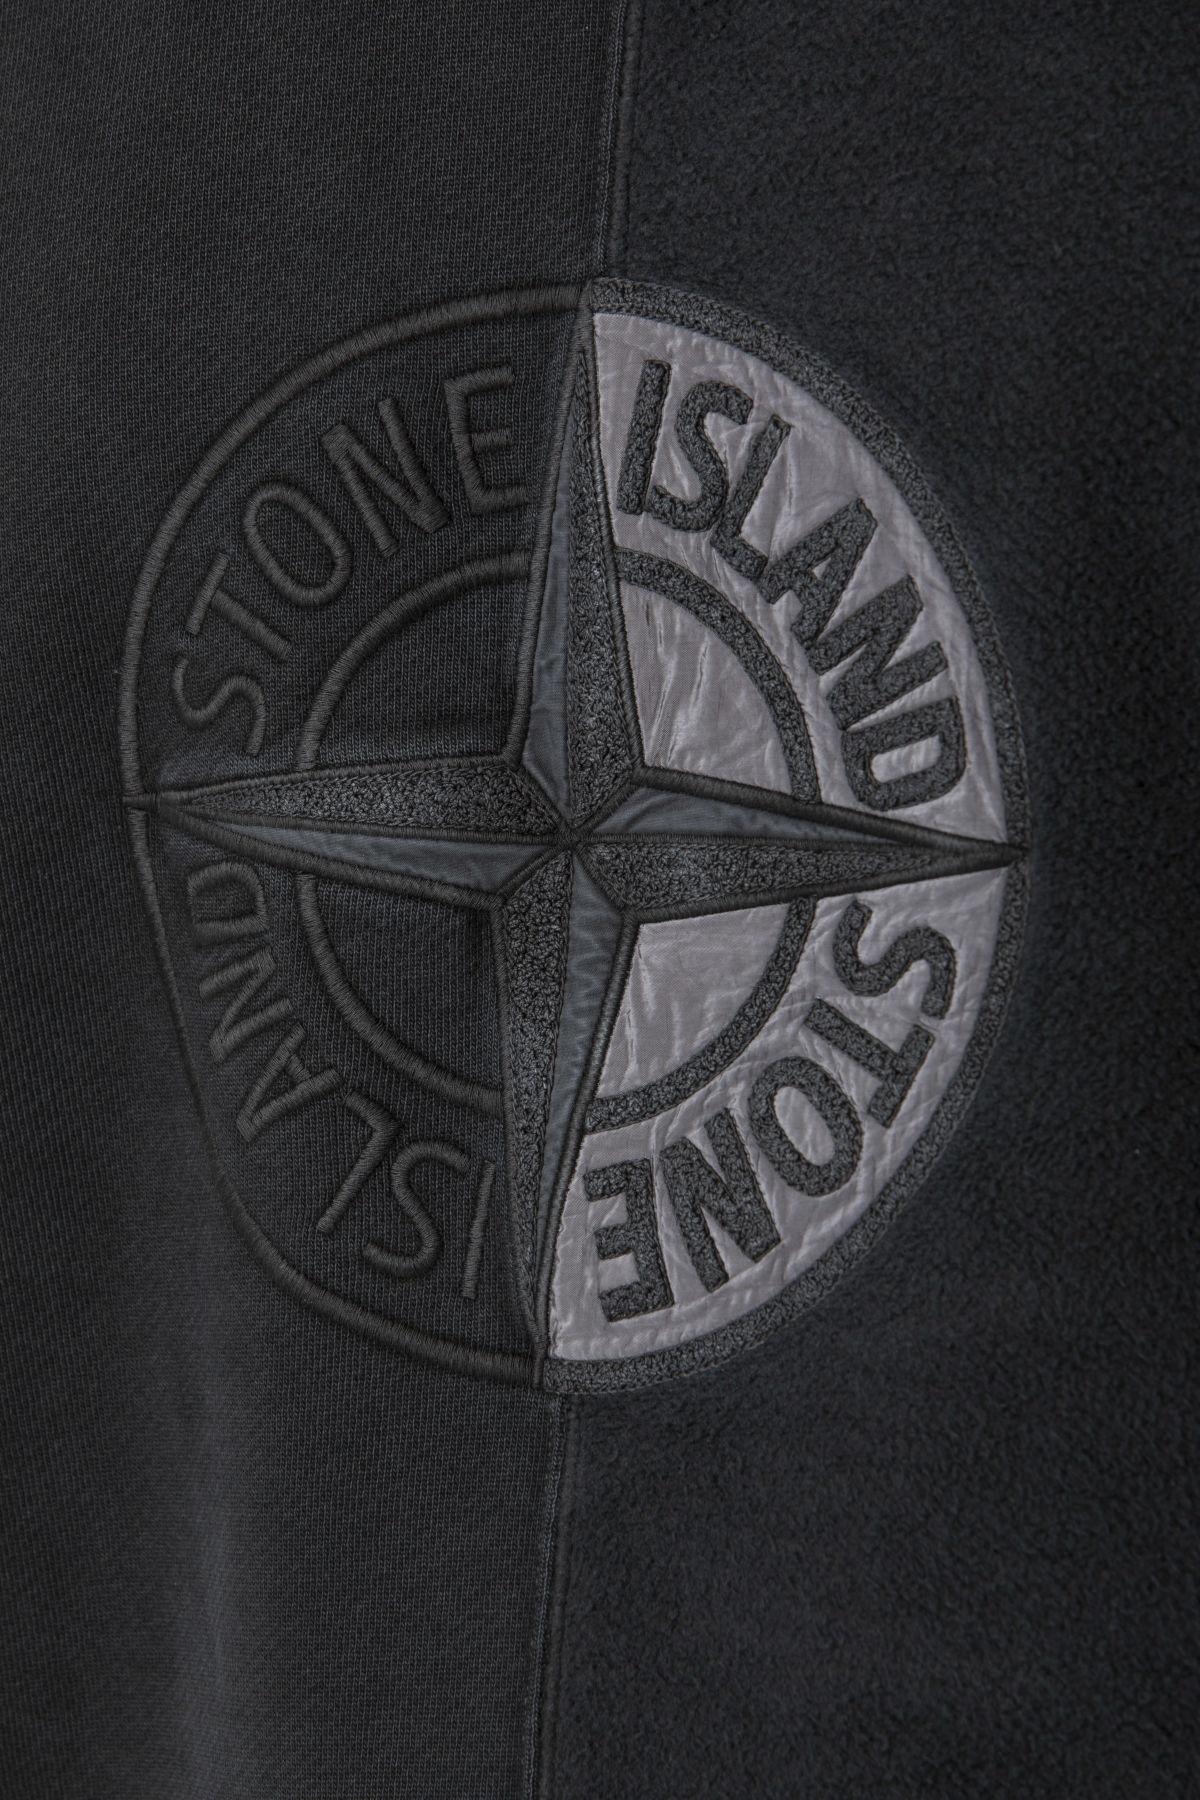 TINTO OLD Sweatshirt for man STONE ISLAND F/W 19-20